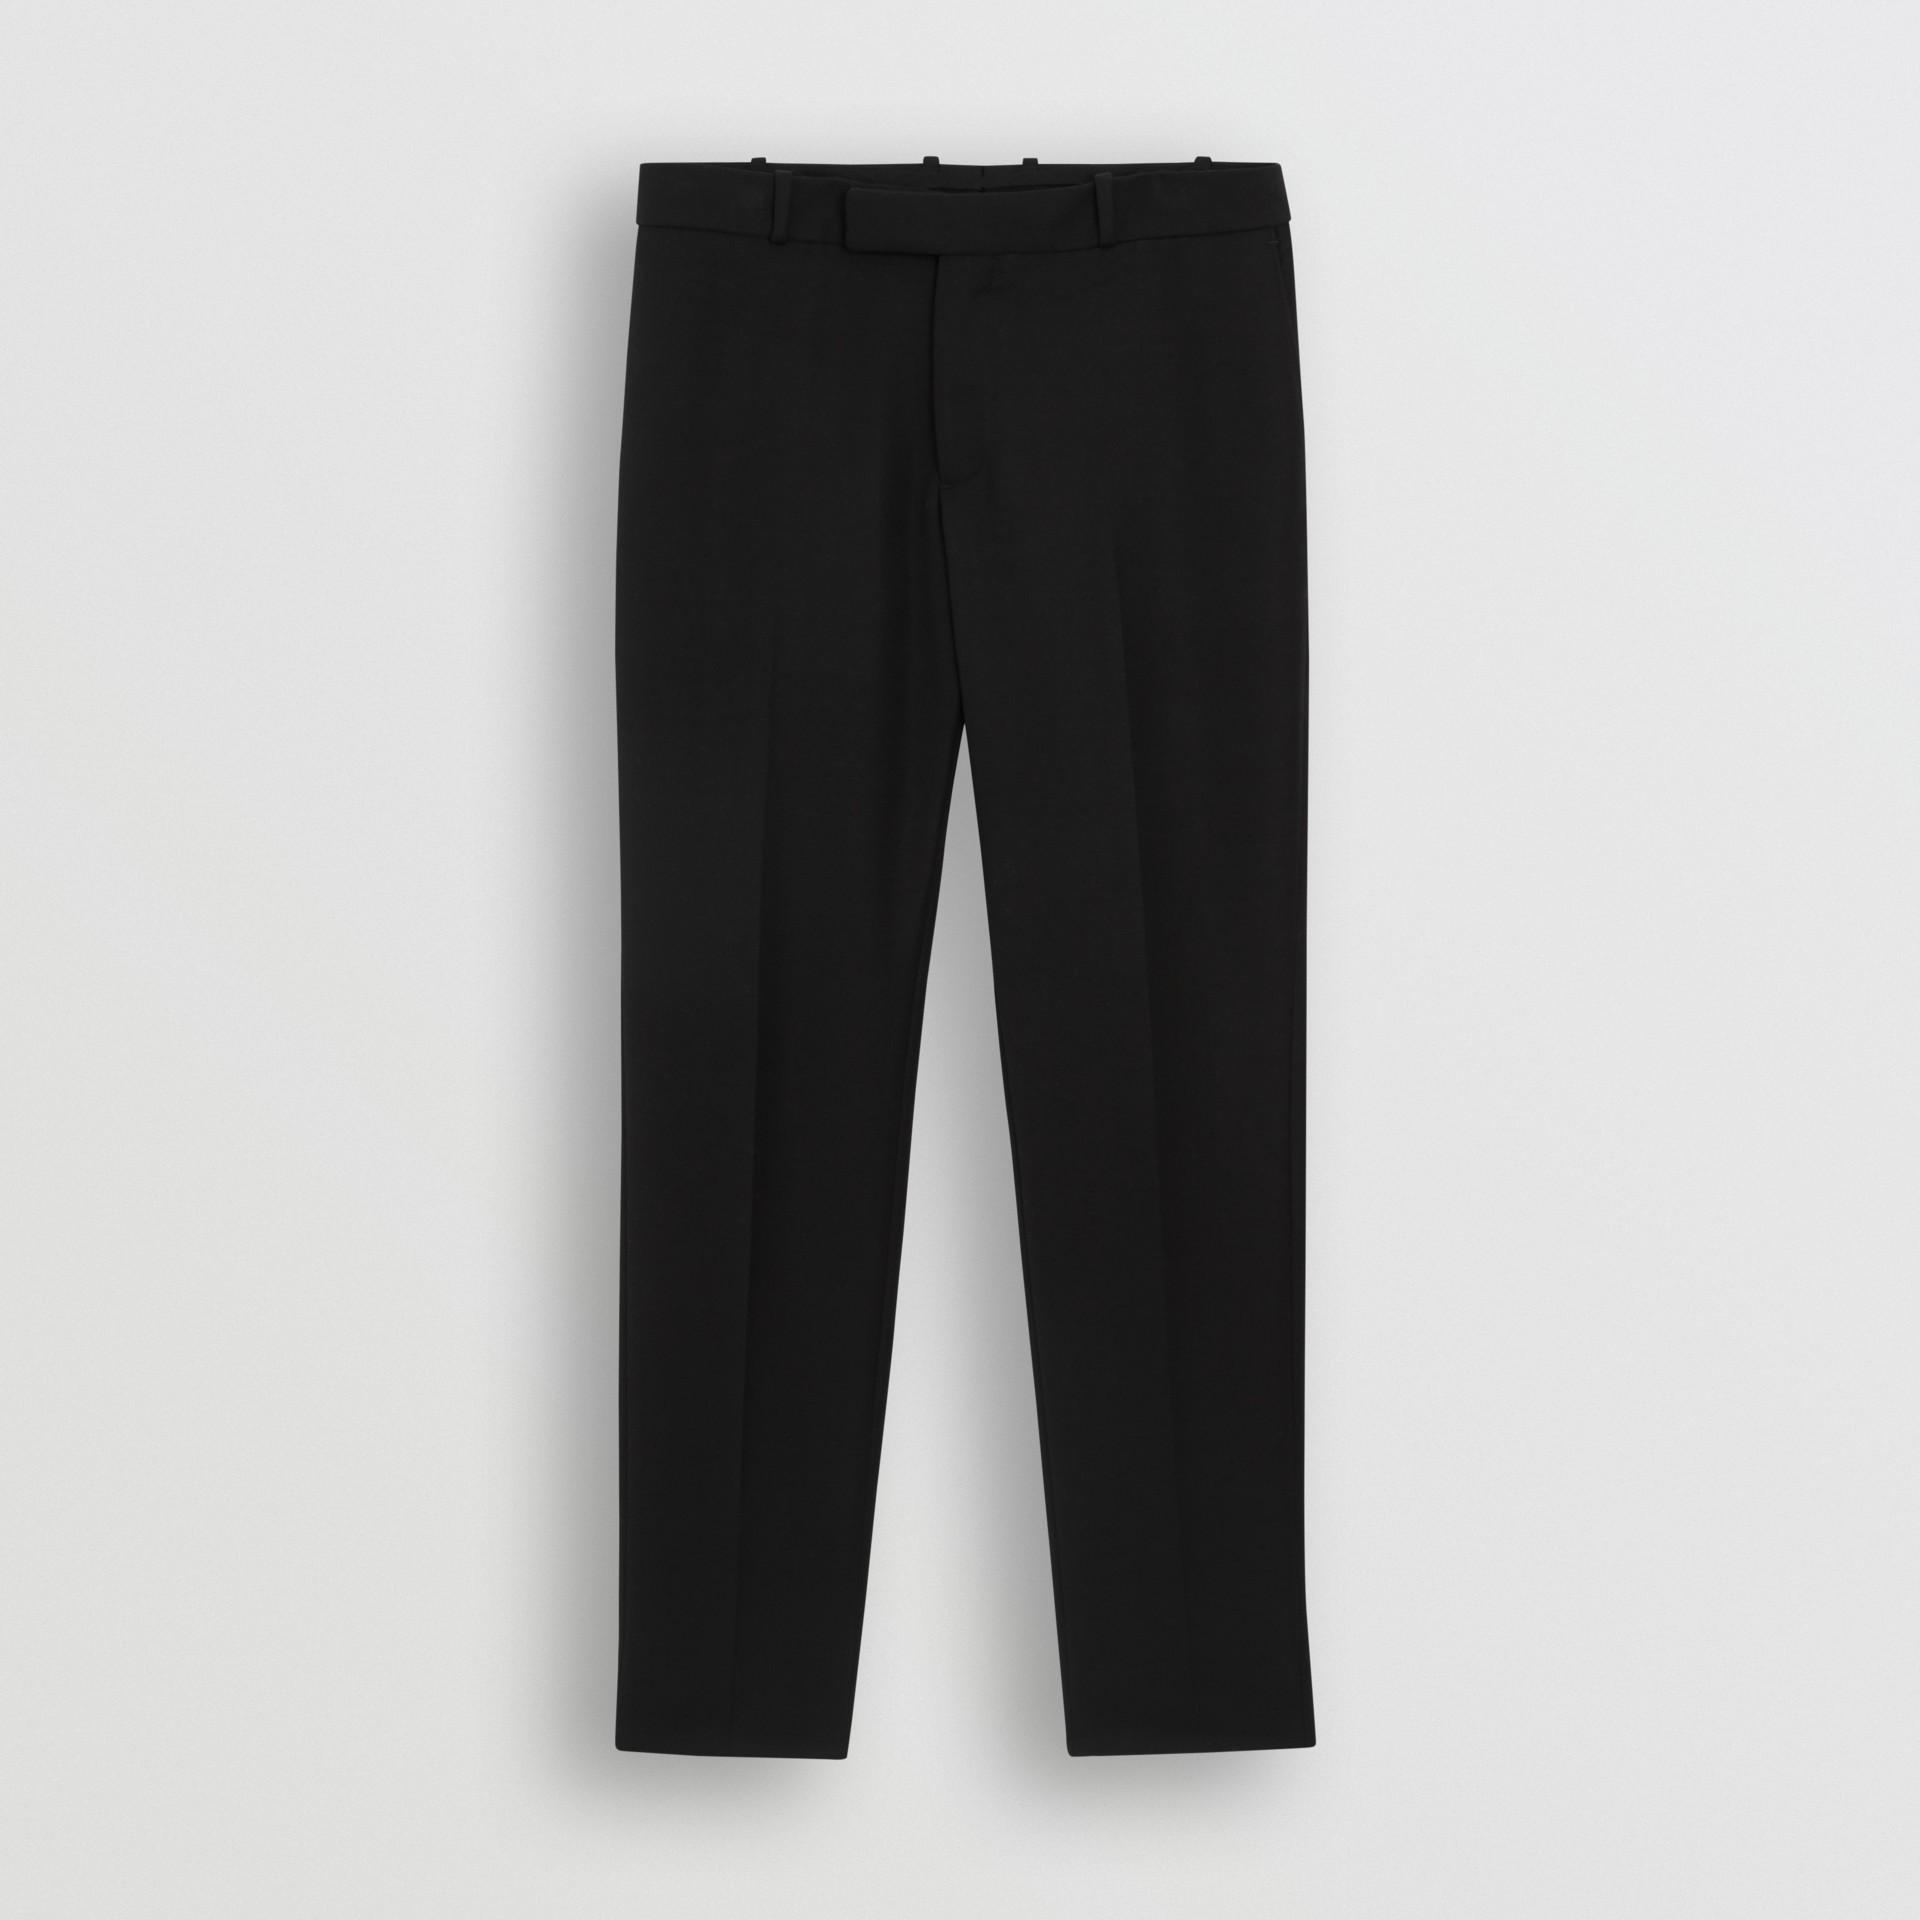 Soho Fit Bullion Stripe Wool Twill Tailored Trousers in Black - Men | Burberry - gallery image 3